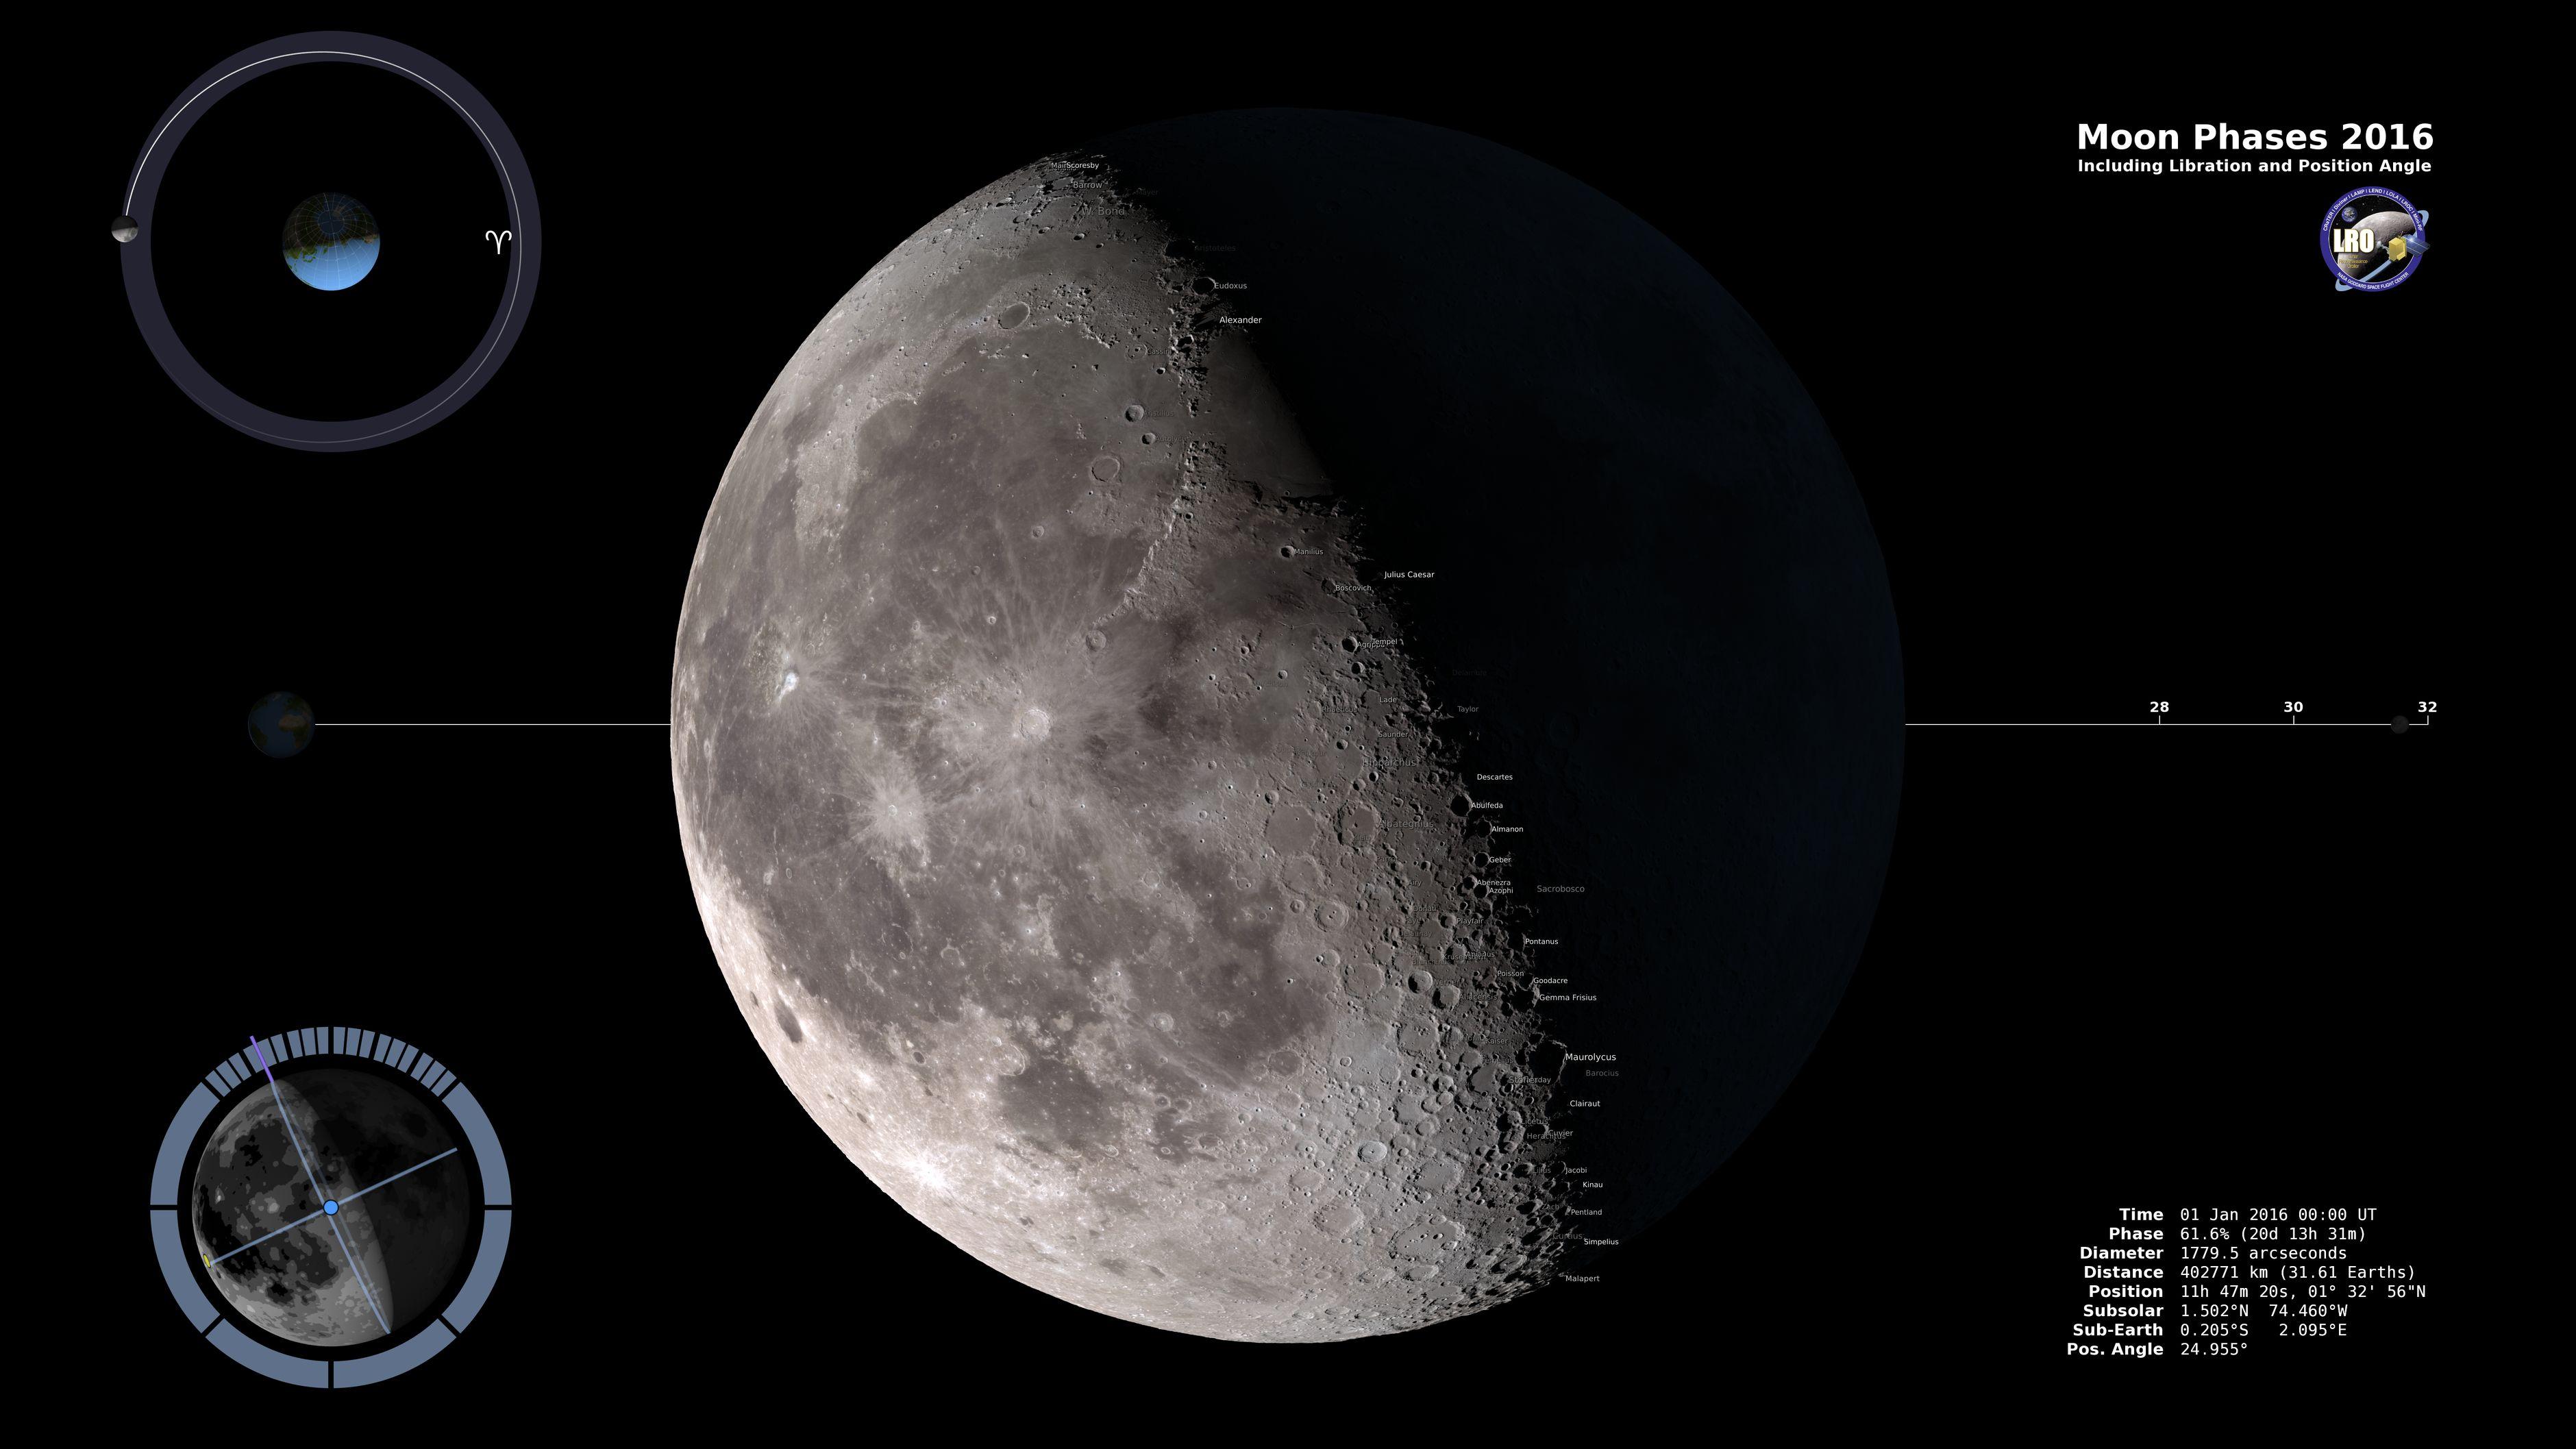 14/11/16 Moon is 14% bigger 30% brighter